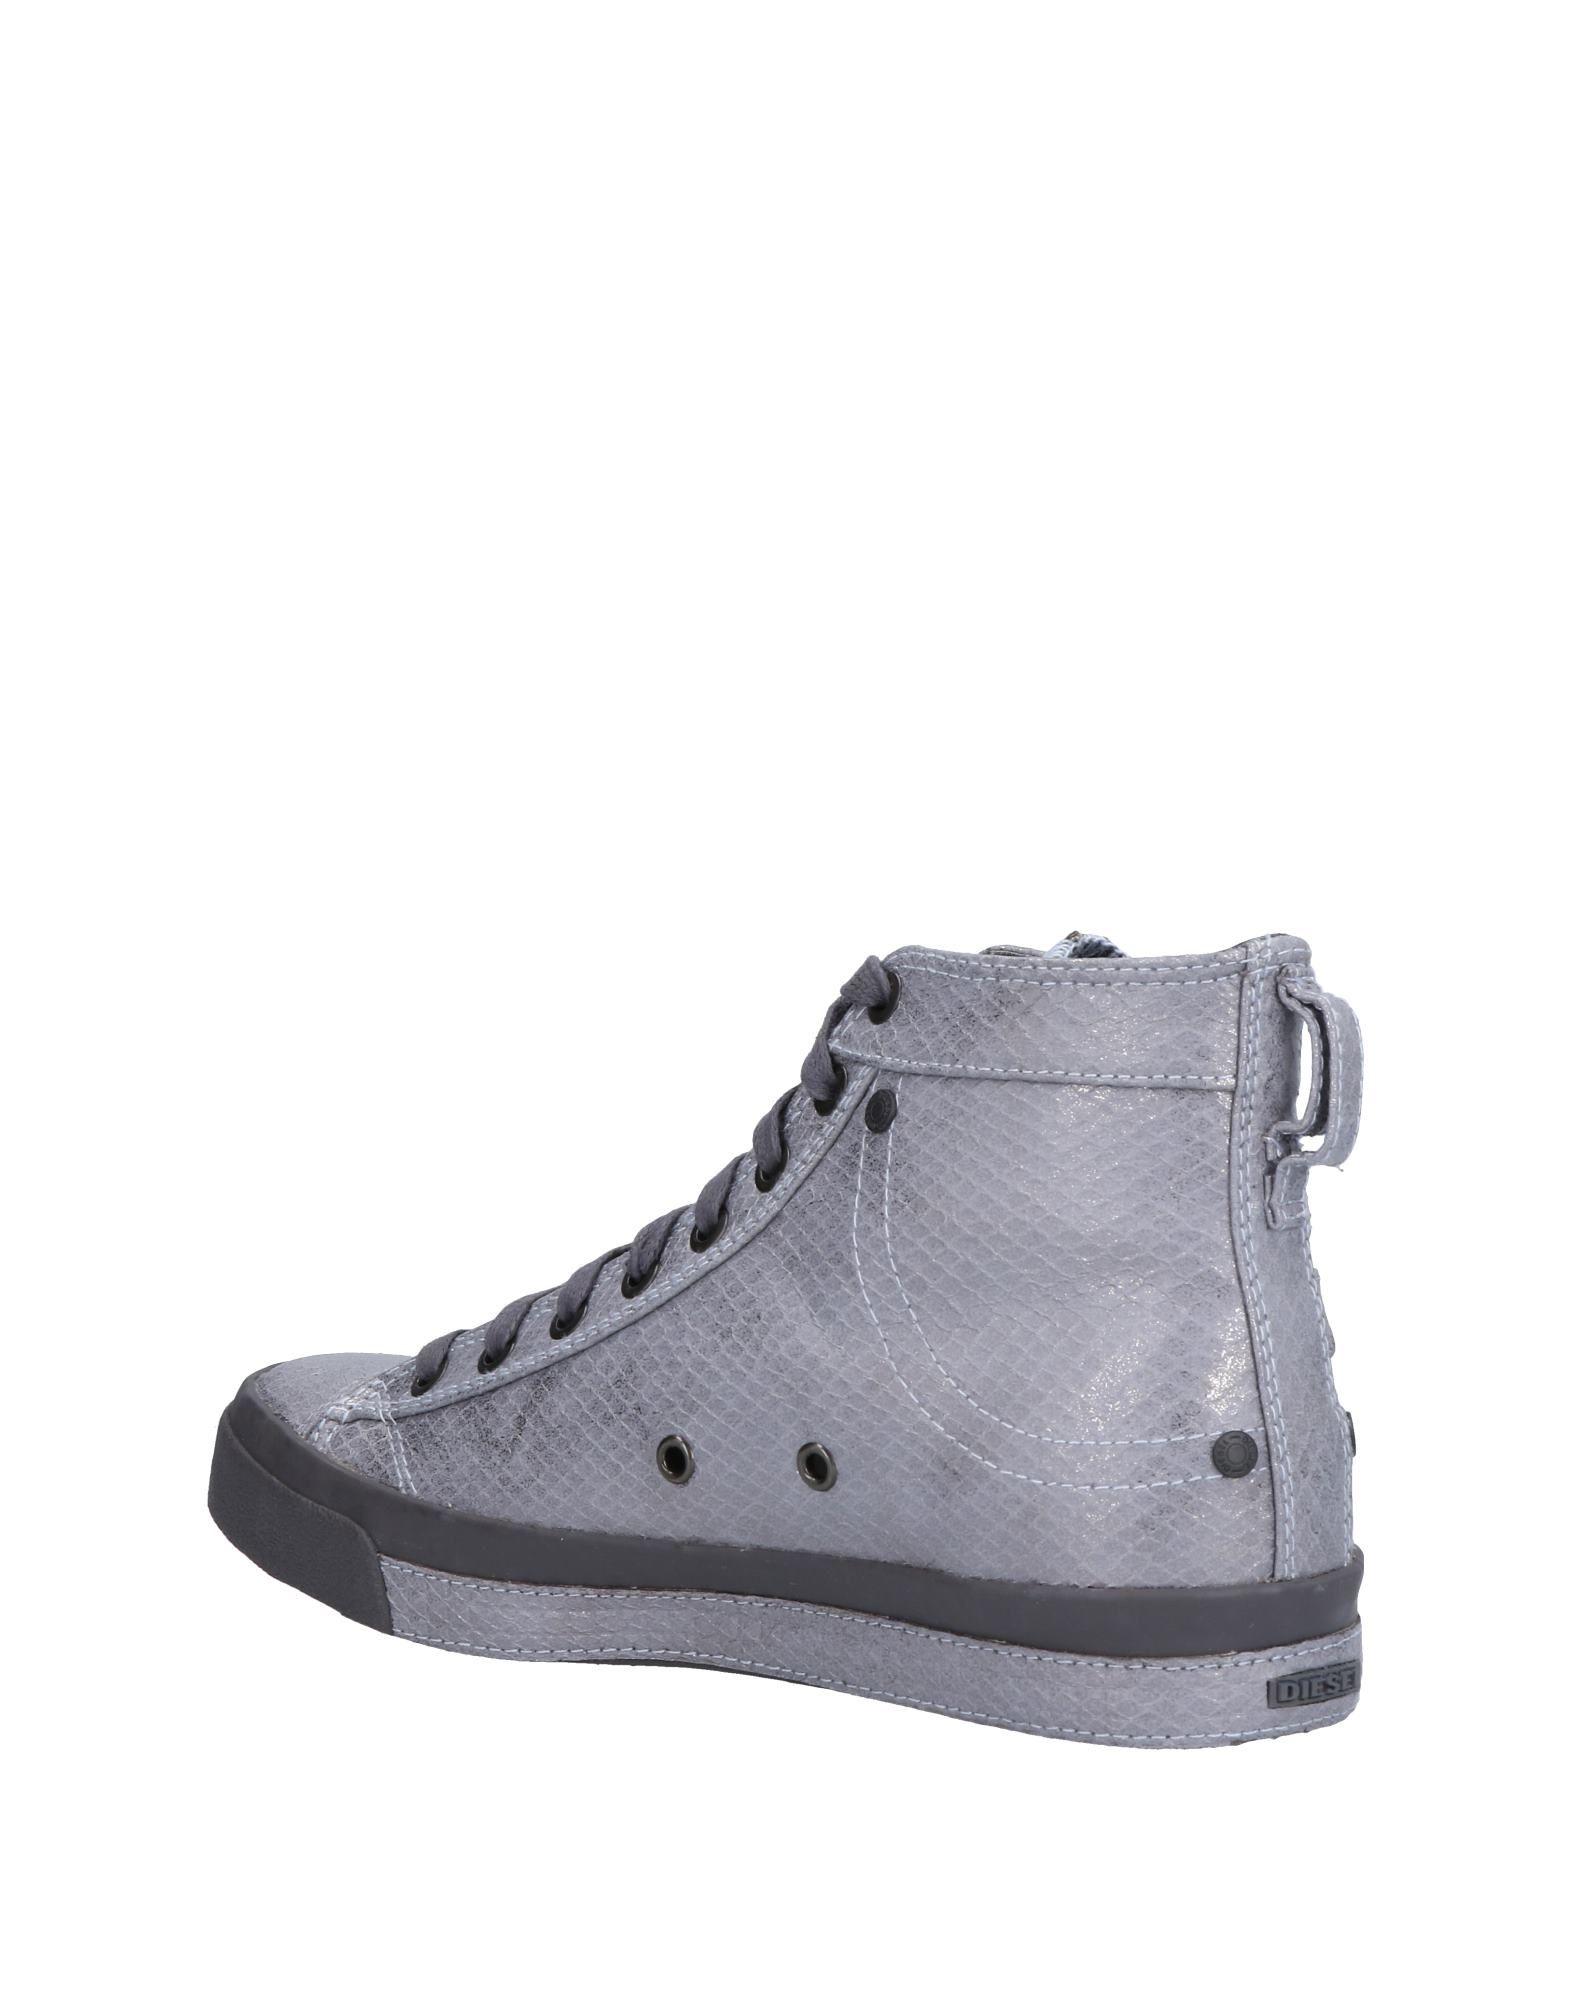 Diesel Sneakers Damen Gute  11491243RO Gute Damen Qualität beliebte Schuhe b04272